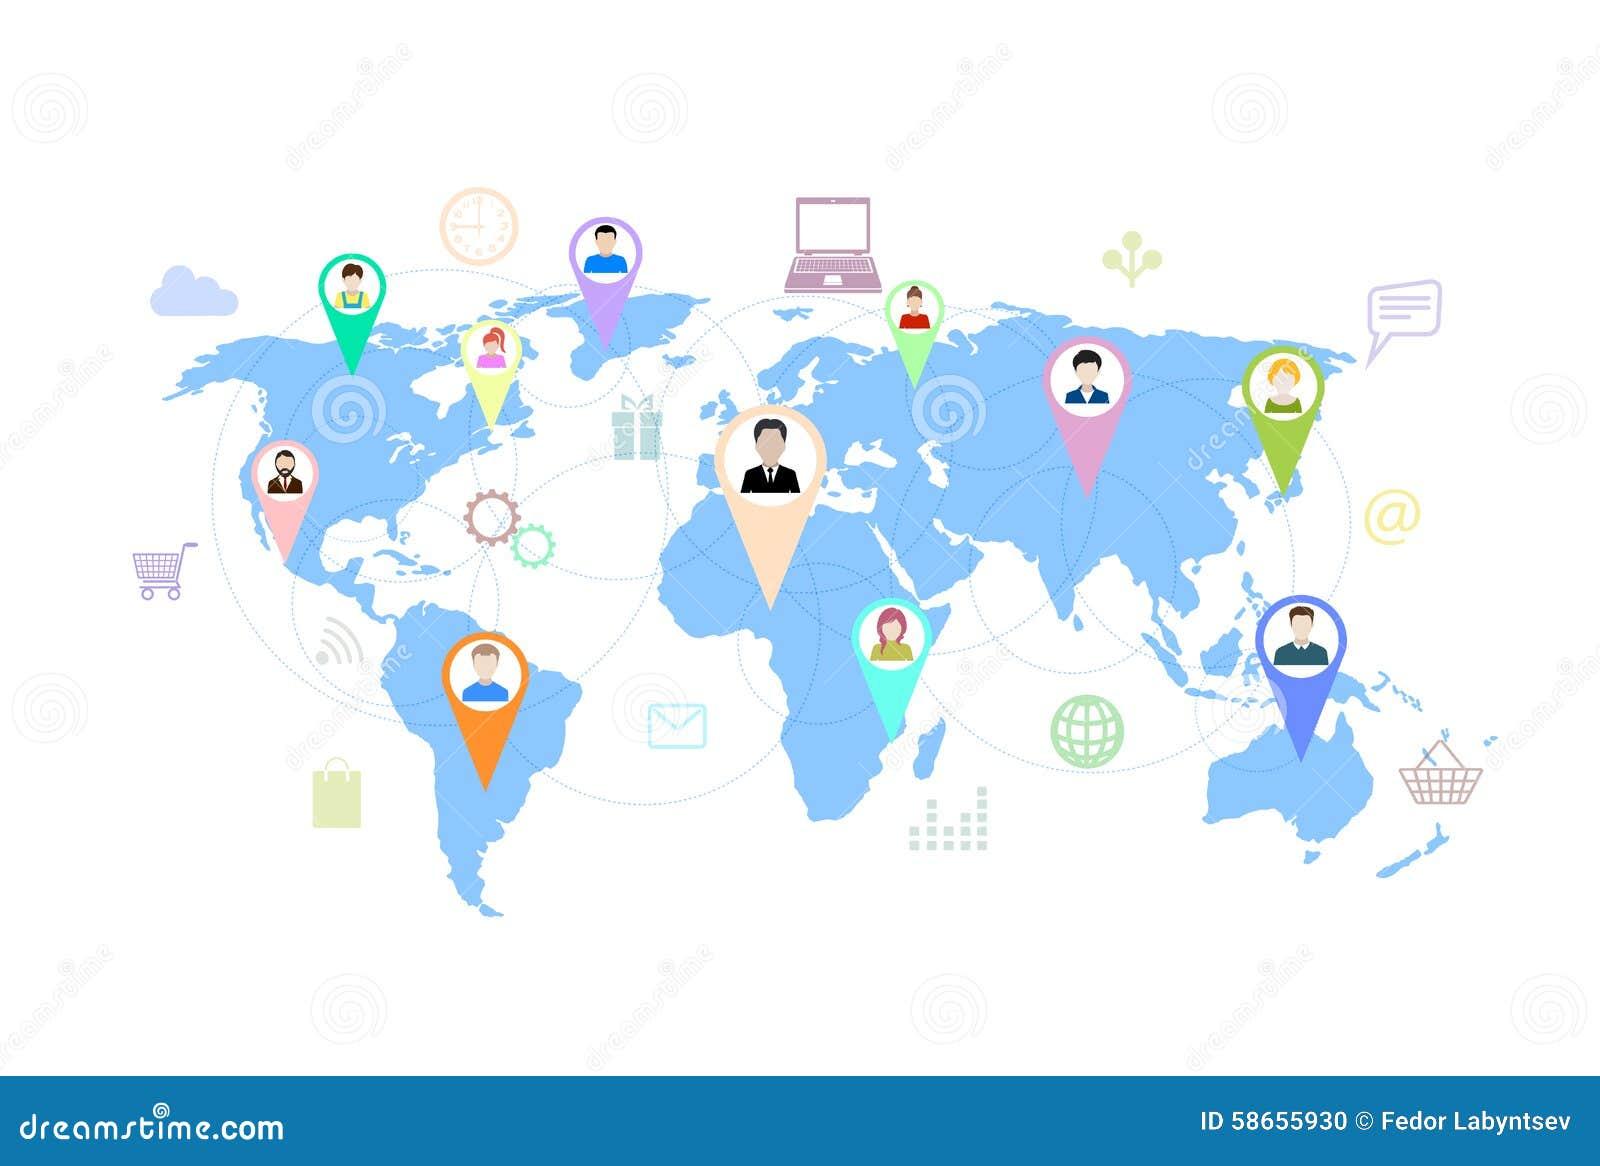 Concept modern zaken en groepswerk online sociale netwerken,